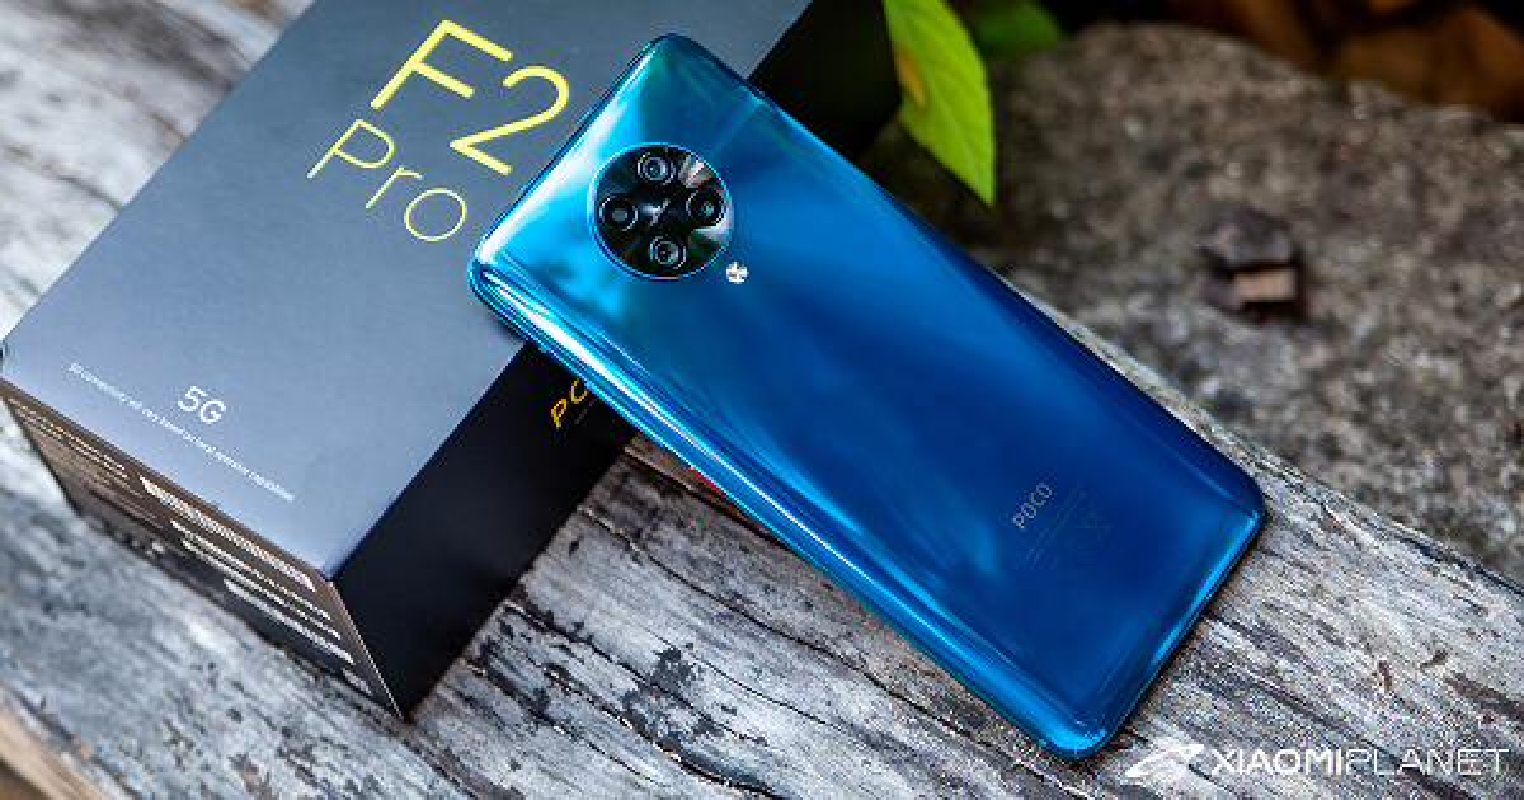 Viet Nam phat song mang 5G: Samsung, iPhone... loi thoi?-Hinh-7